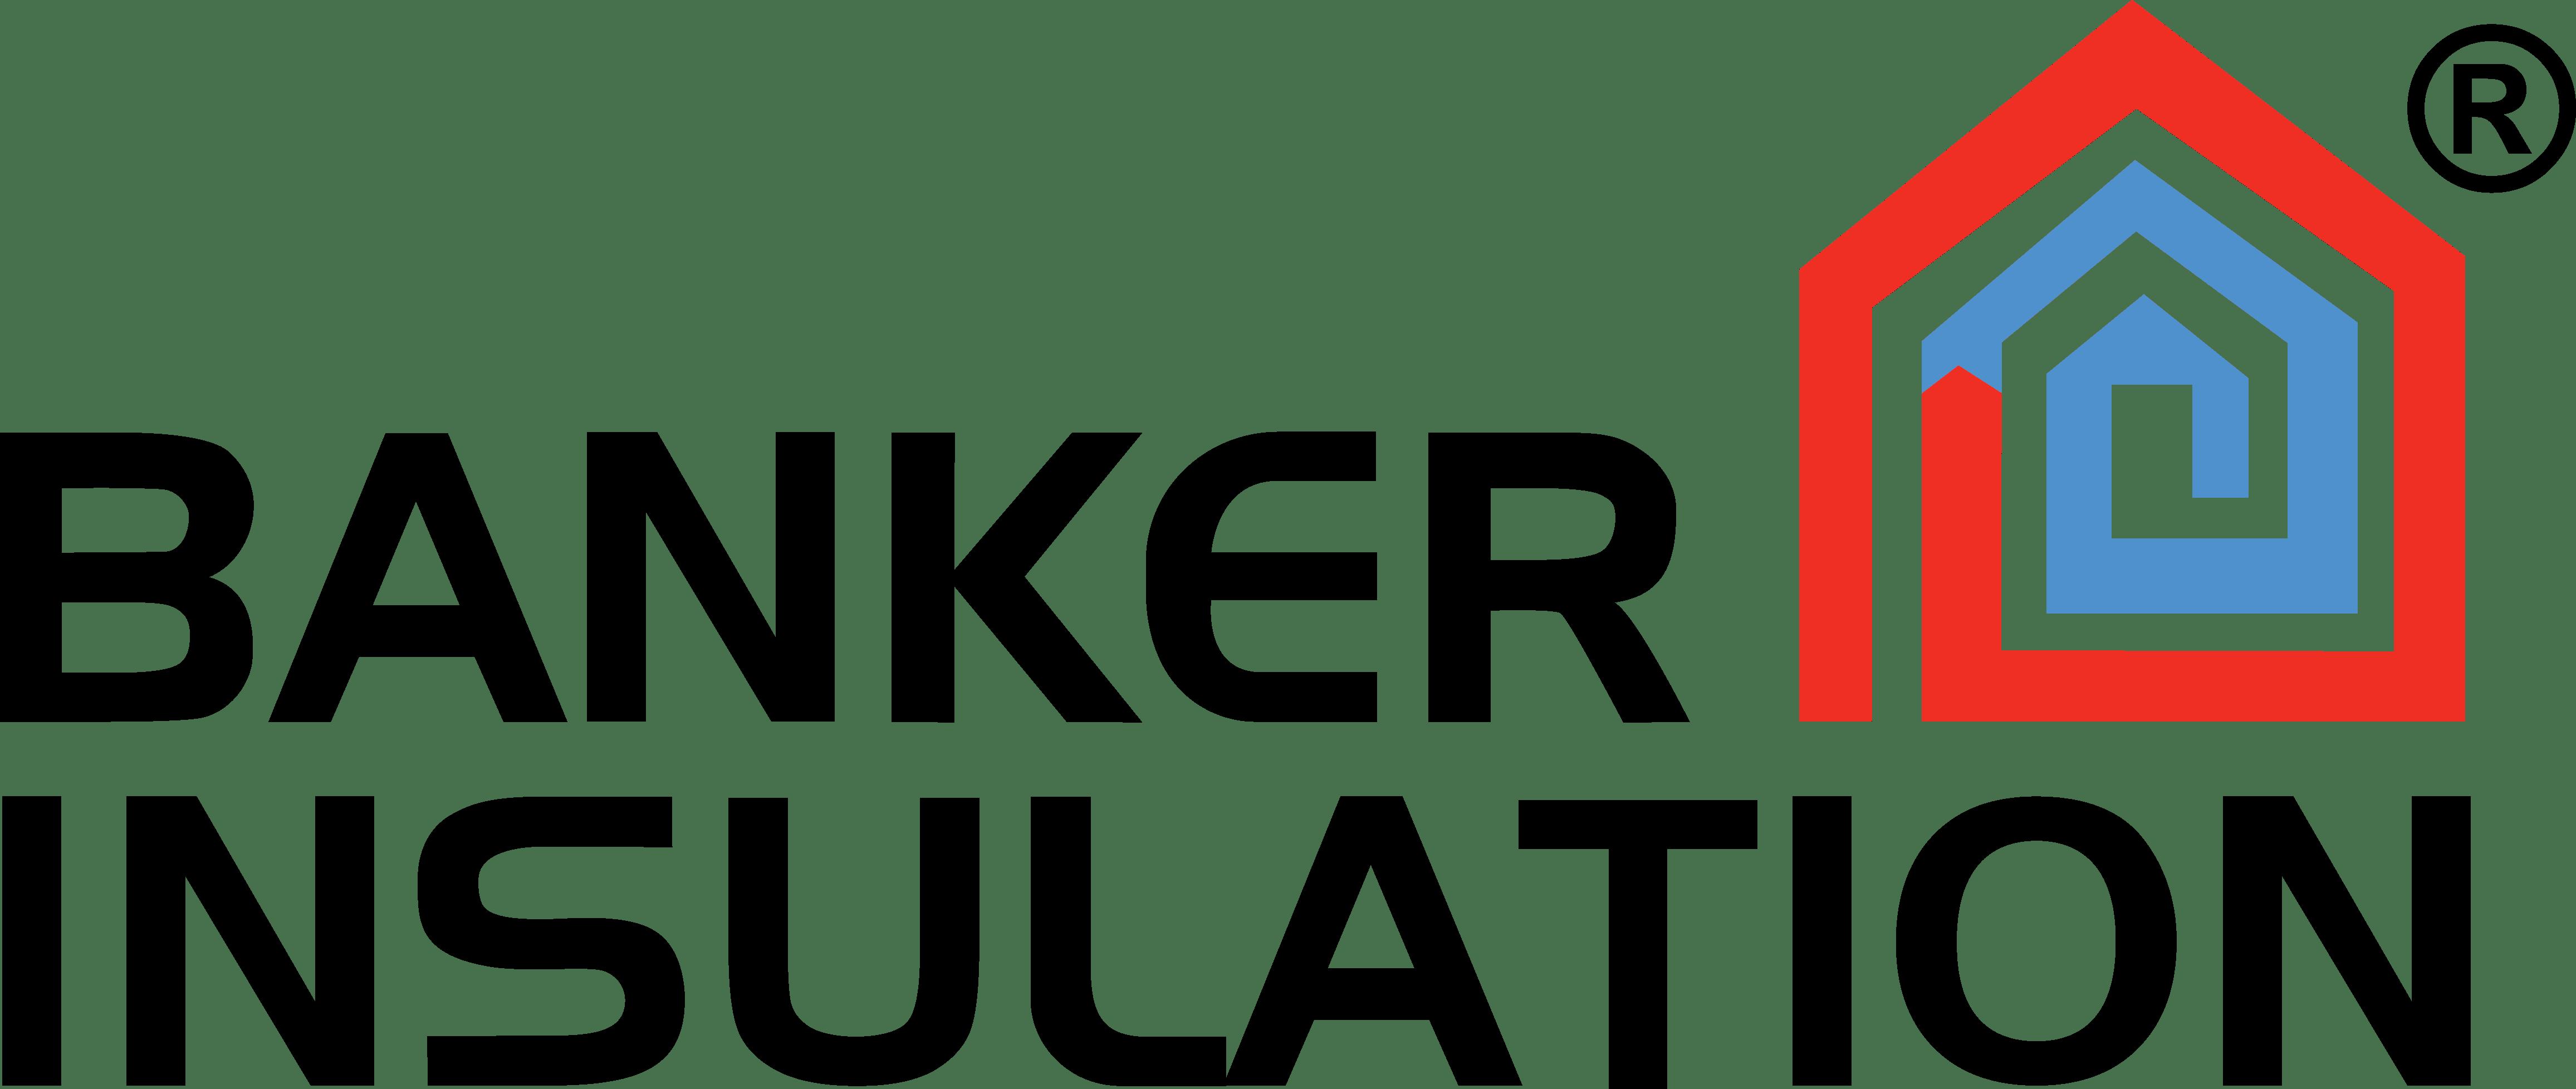 Banker Insulation, Inc.